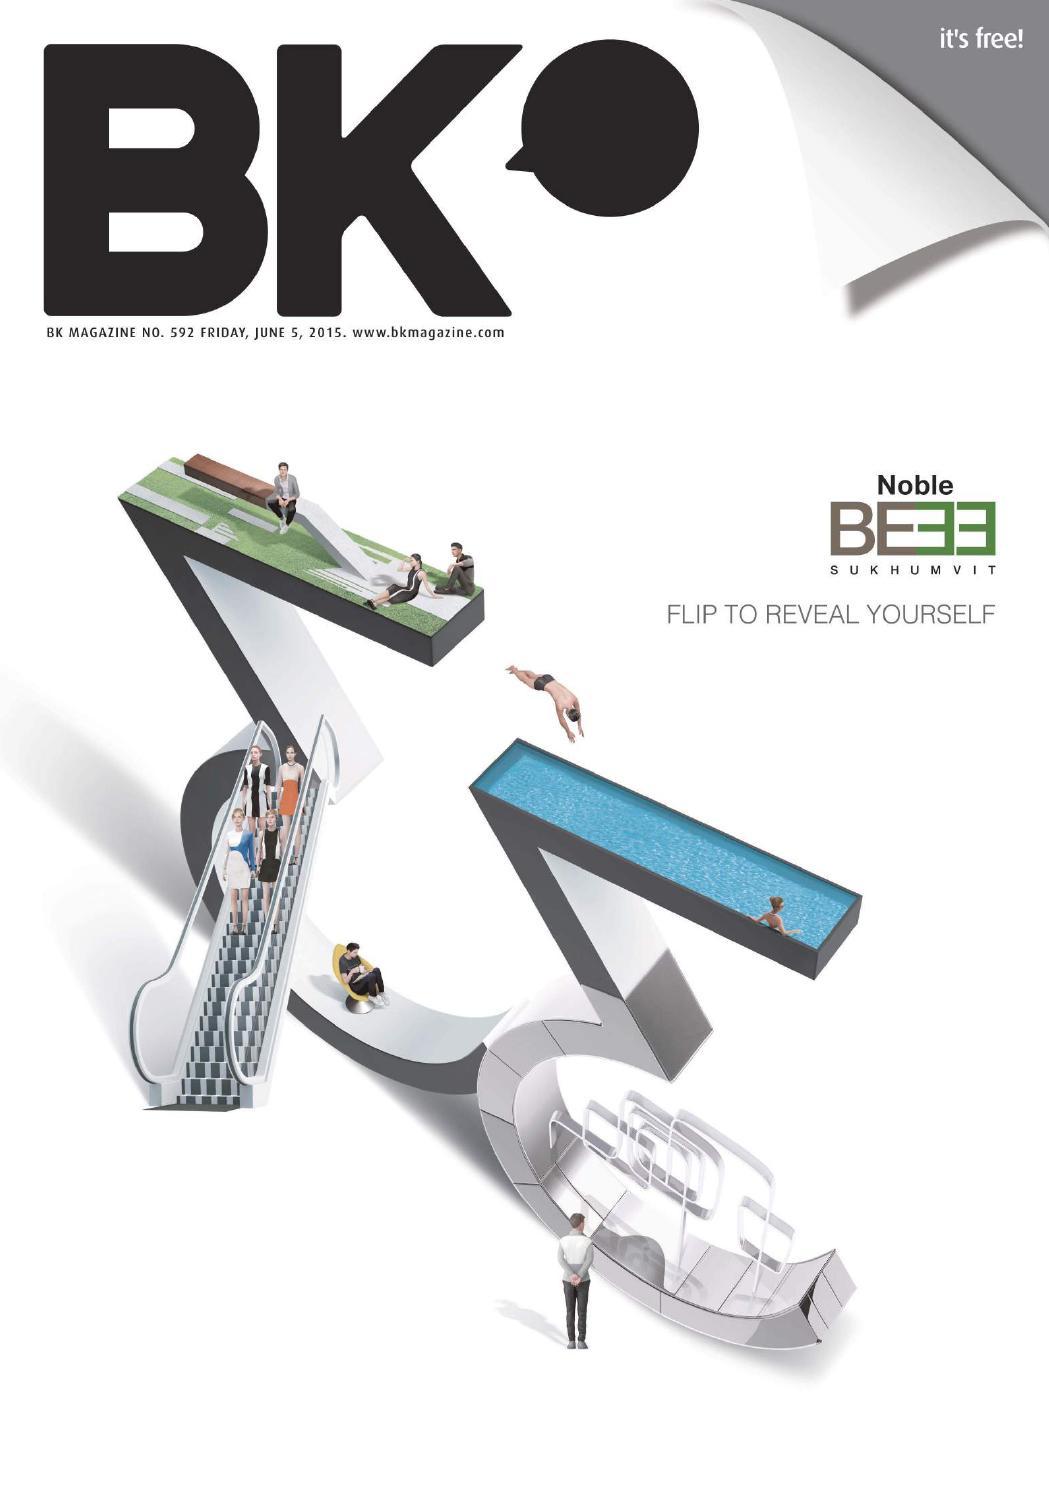 BK Magazine 592 June 05, 2015 by BK Magazine - issuu